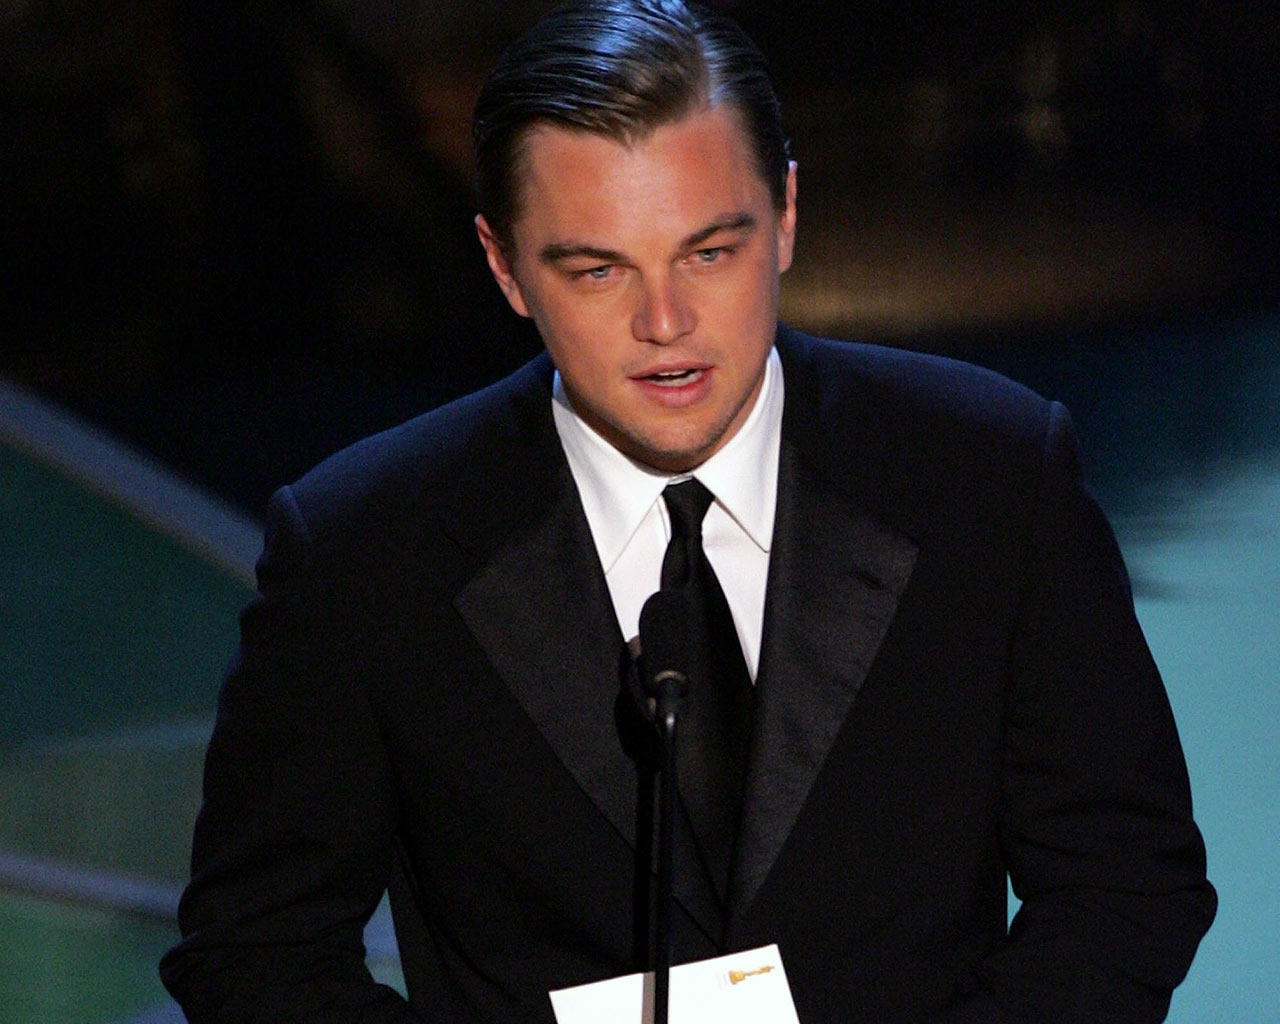 http://3.bp.blogspot.com/-bQYUwpAJQ2E/UO6FsbYd2CI/AAAAAAAAH9I/zndsVS7EKcc/s1600/Leonardo+DiCaprio82.jpg